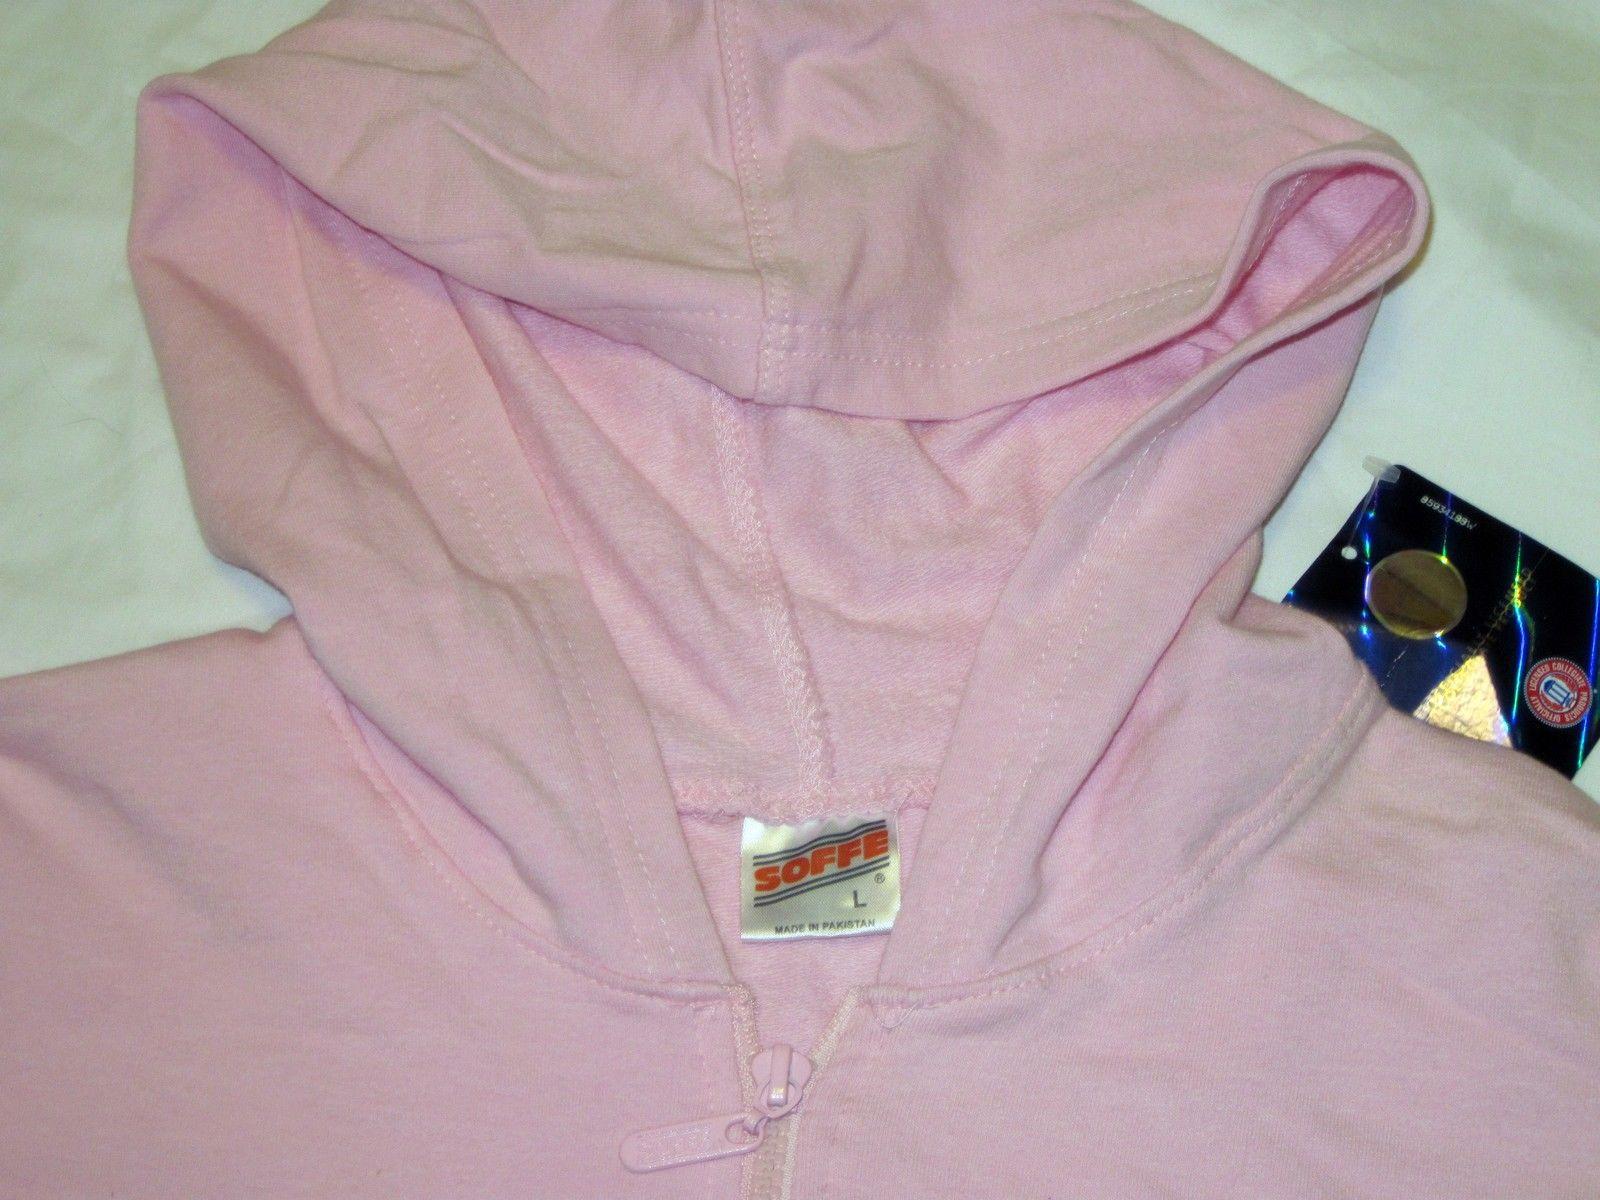 NWT University of Florida UF Gators Hoodie Zipper Jacket Pink Lt Gray by Soffe image 8